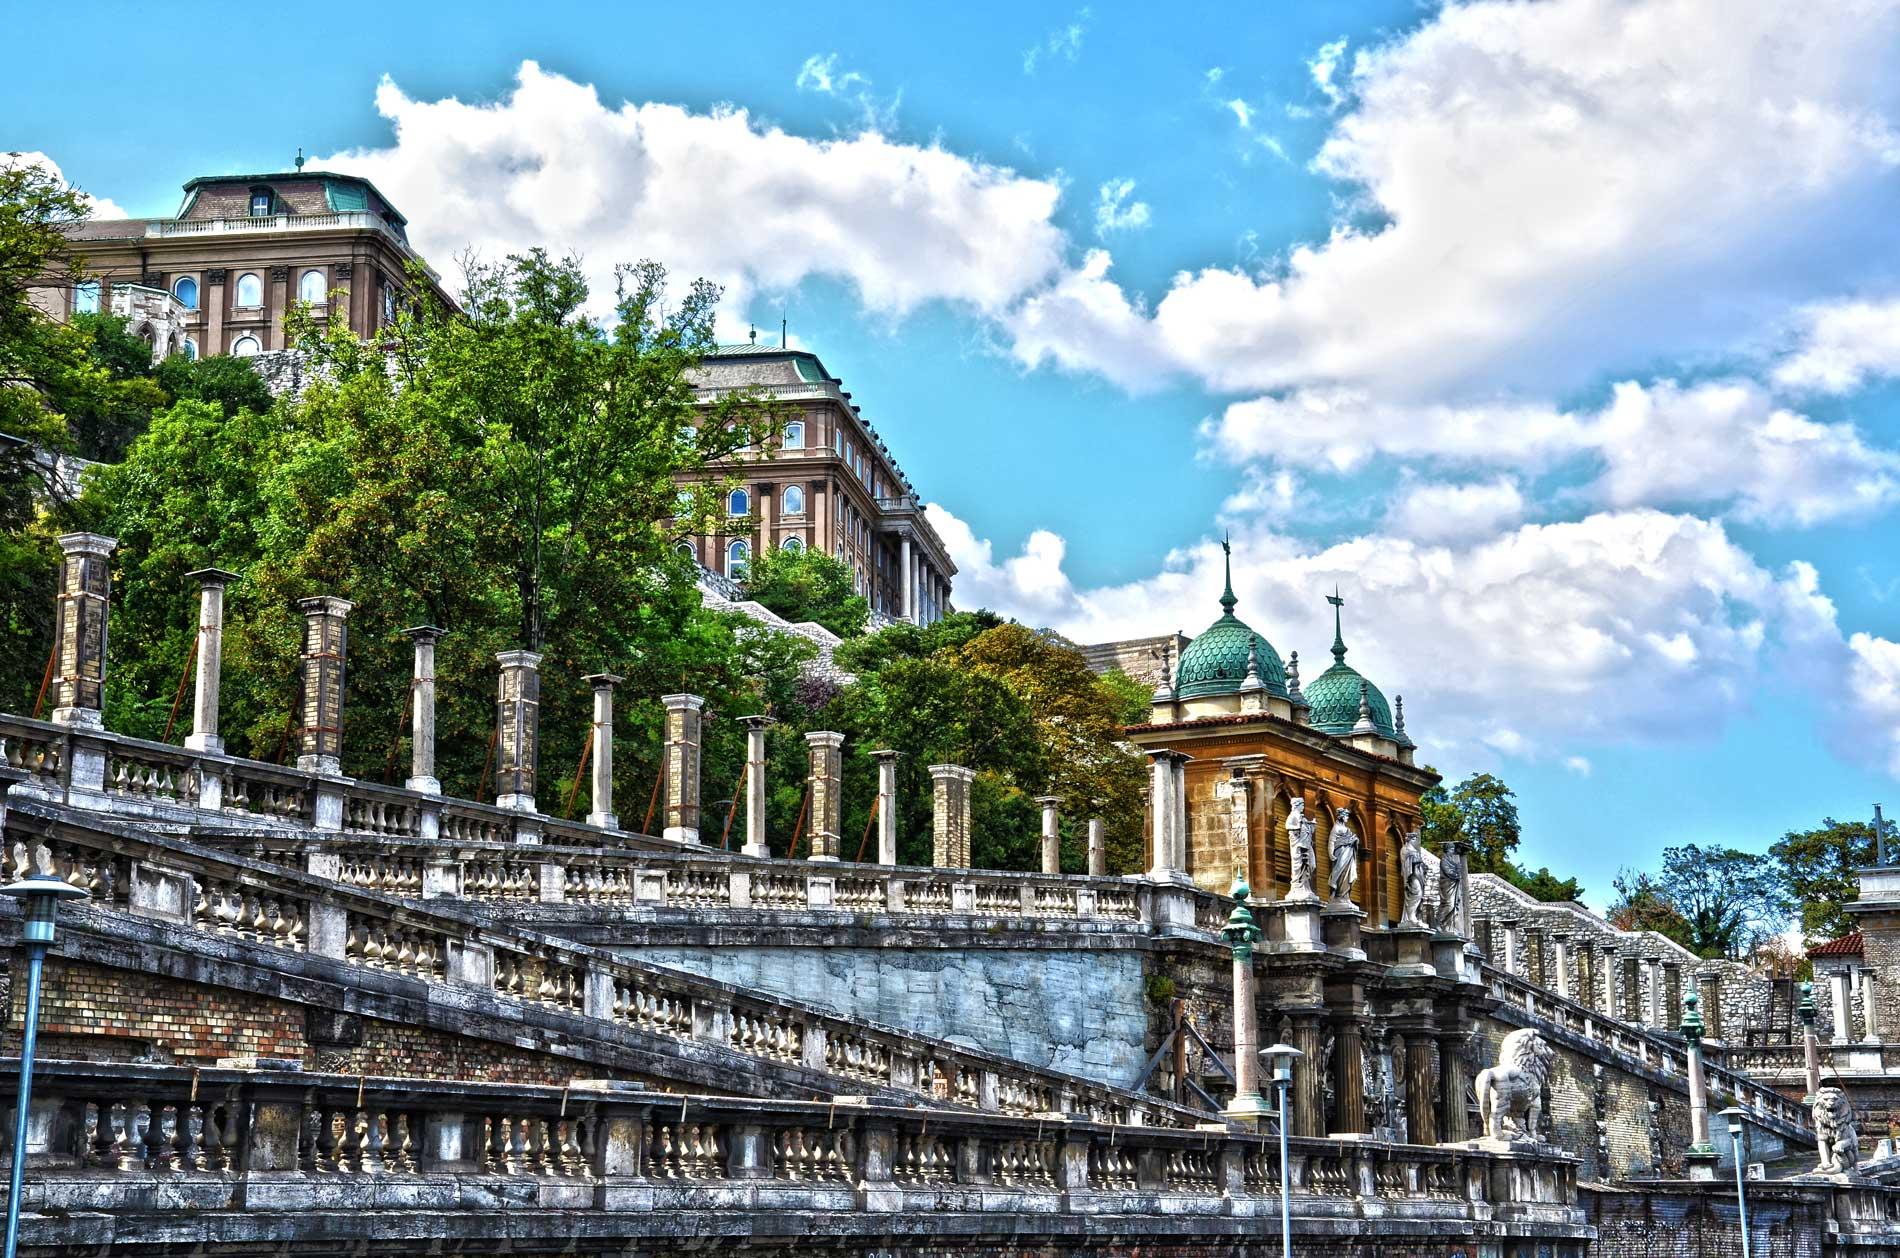 photography_atthary_budapest_monumental_07